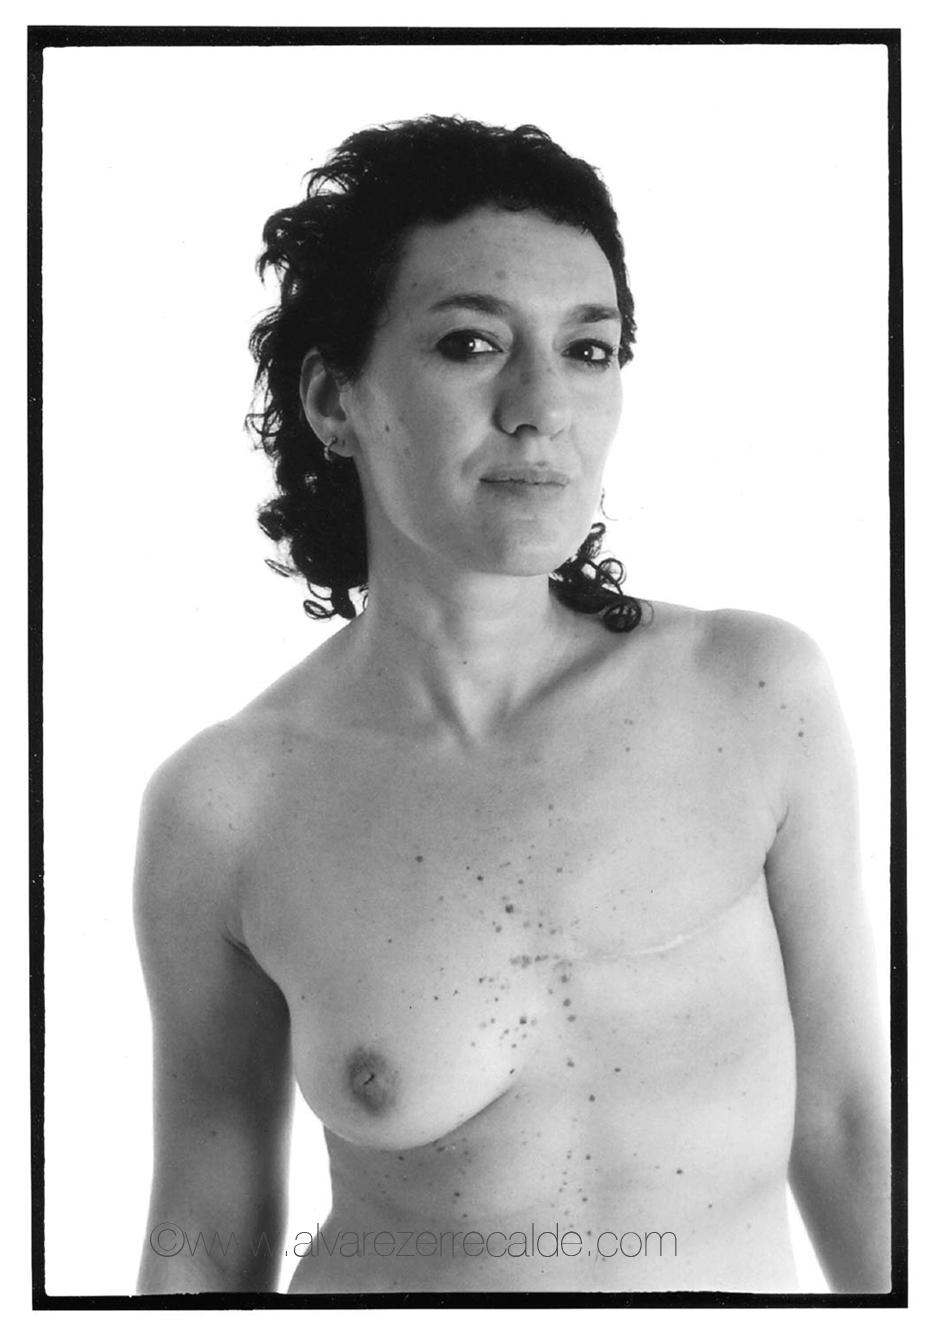 Carmen - 2004